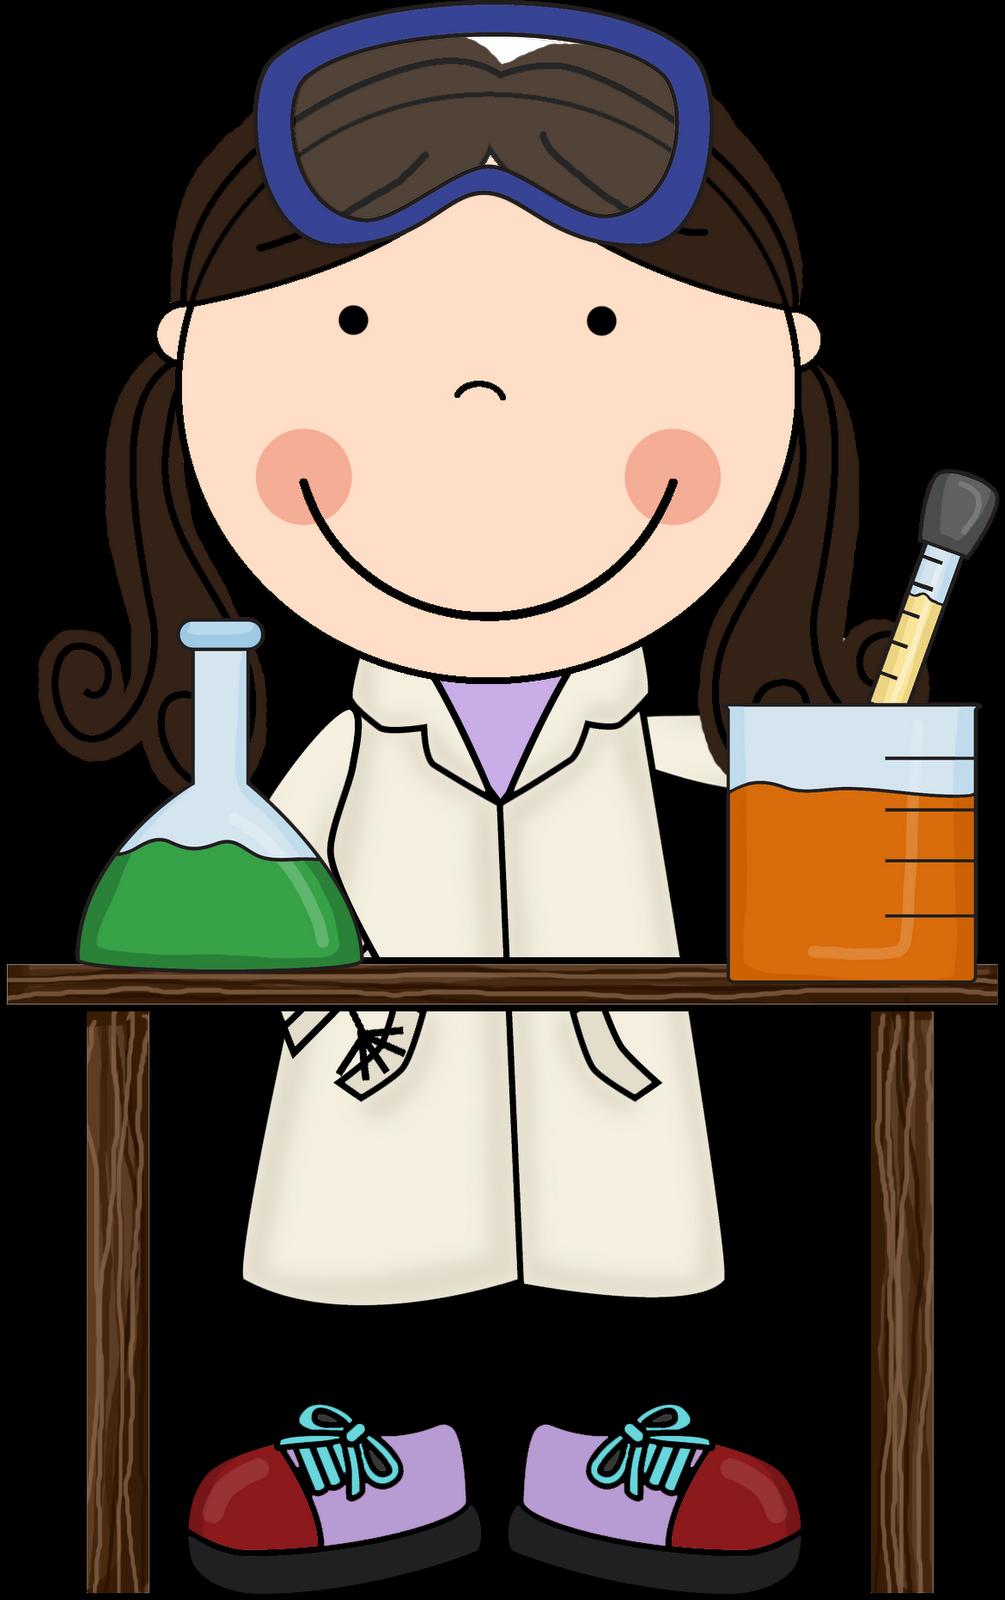 clip art transparent download For free download best. Kids science clipart